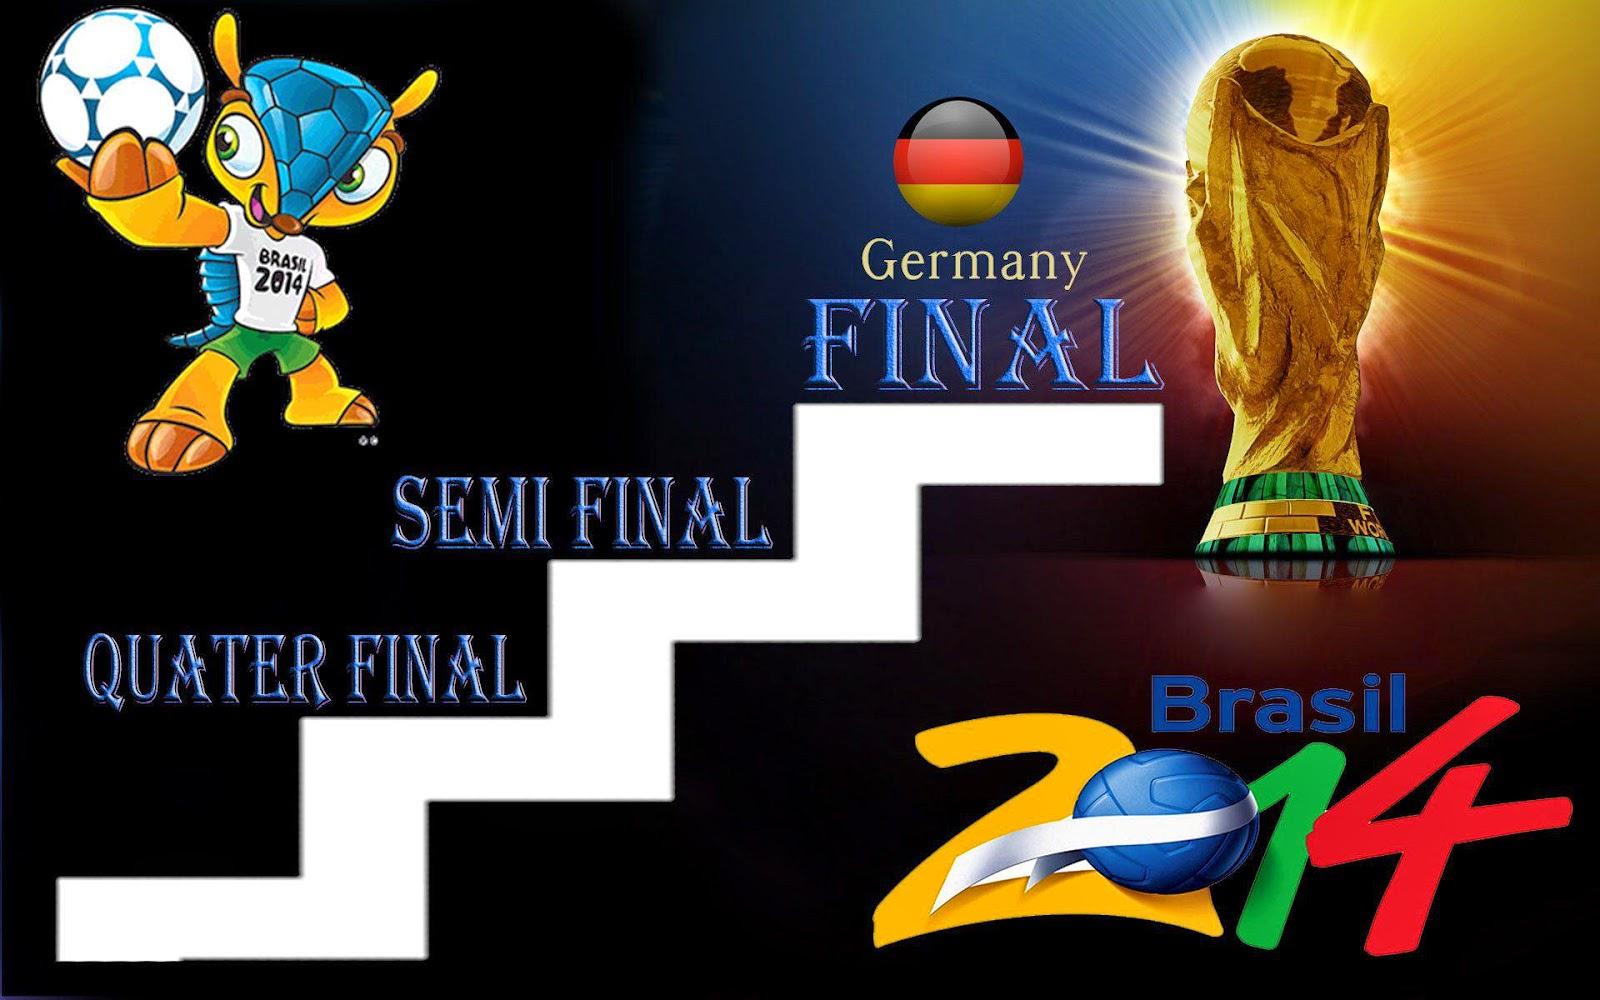 HD FIFA 2014 World Cup - Germany Finals Wallpaper